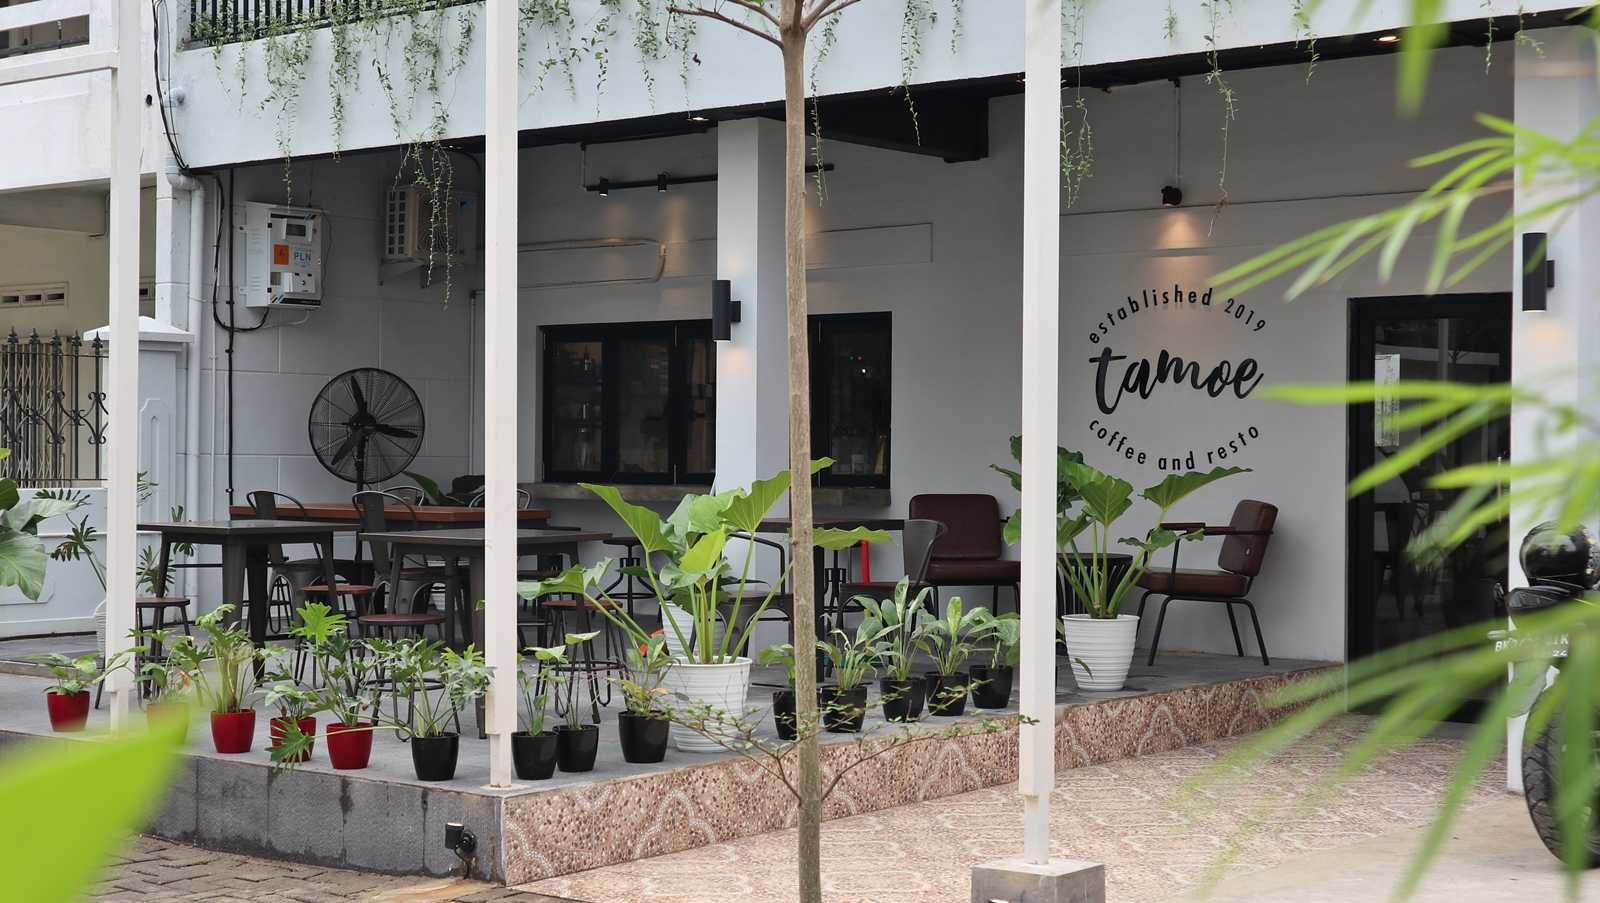 Bd Studio Tamoe Coffee & Resto Medan, Kota Medan, Sumatera Utara, Indonesia Medan, Kota Medan, Sumatera Utara, Indonesia Bd-Studio-Tamoe-Coffee-Resto  80738